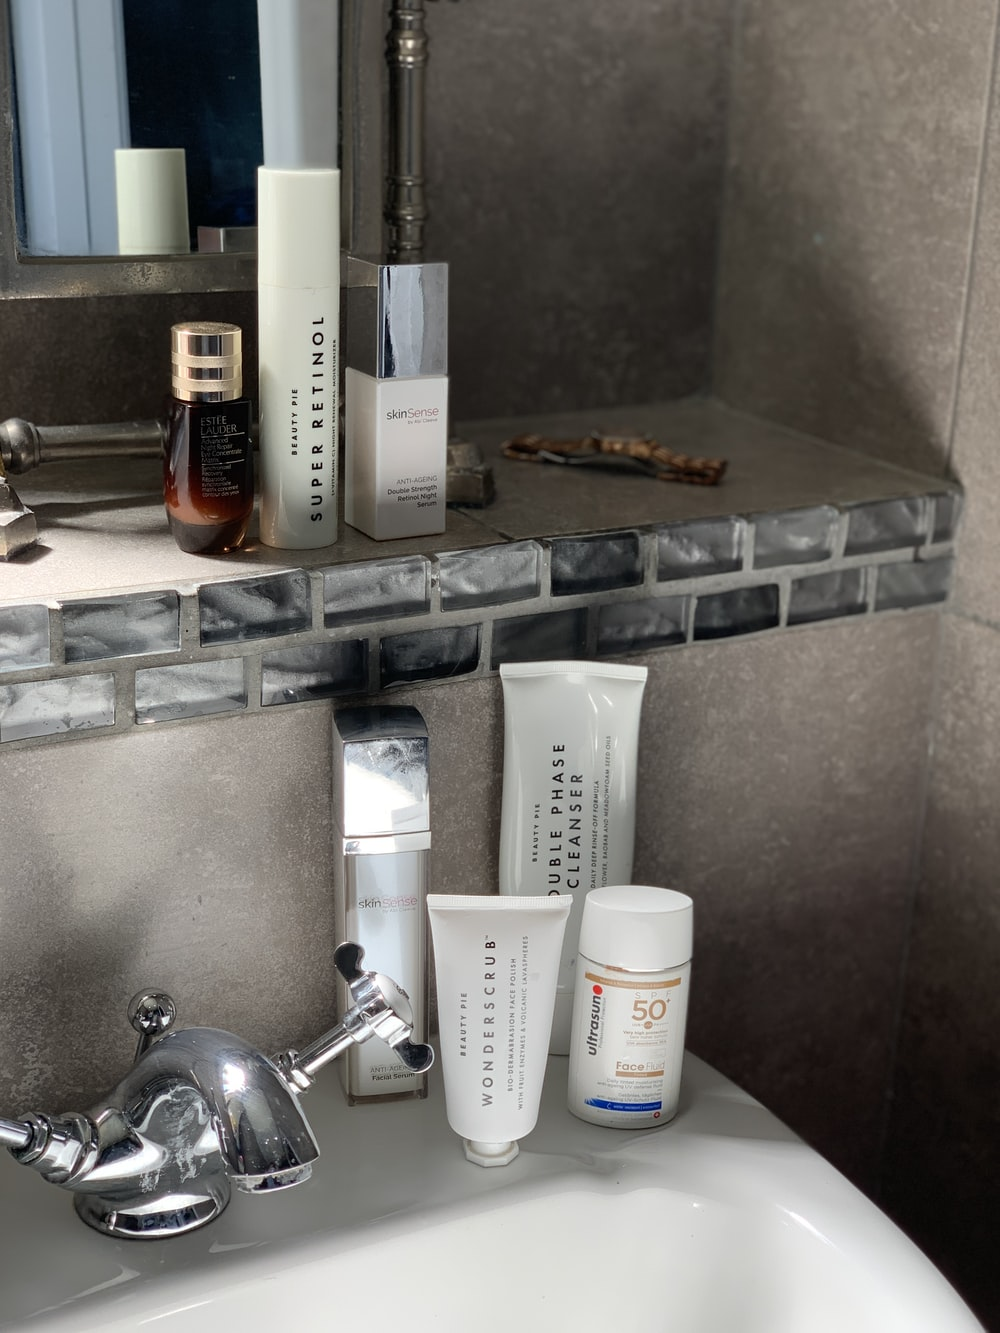 white plastic bottle on stainless steel sink